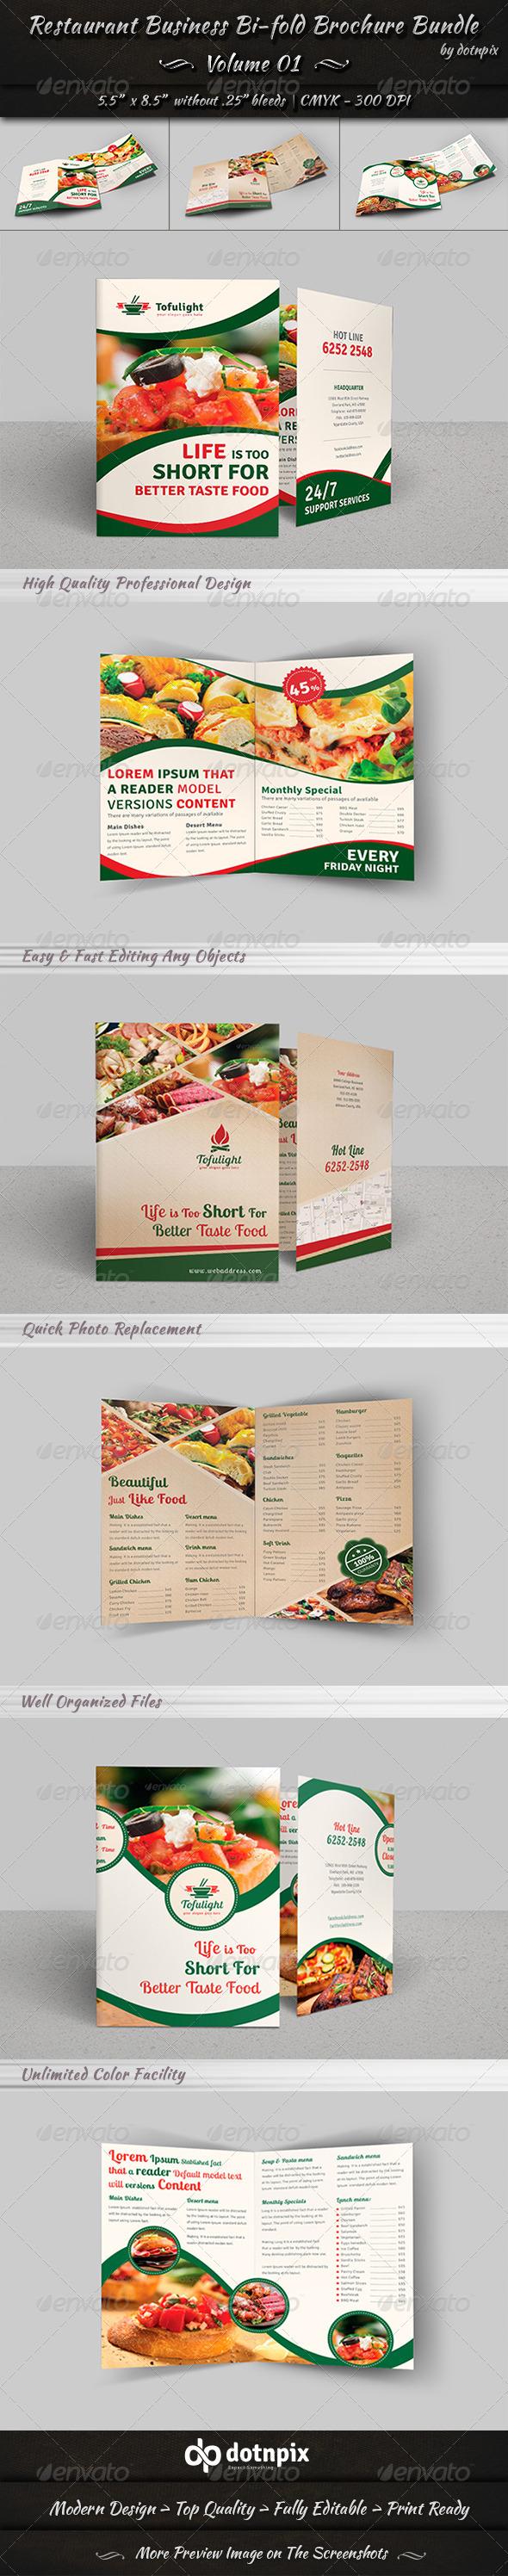 GraphicRiver Restaurant Bi-fold Brochure Bundle Volume 1 7360849